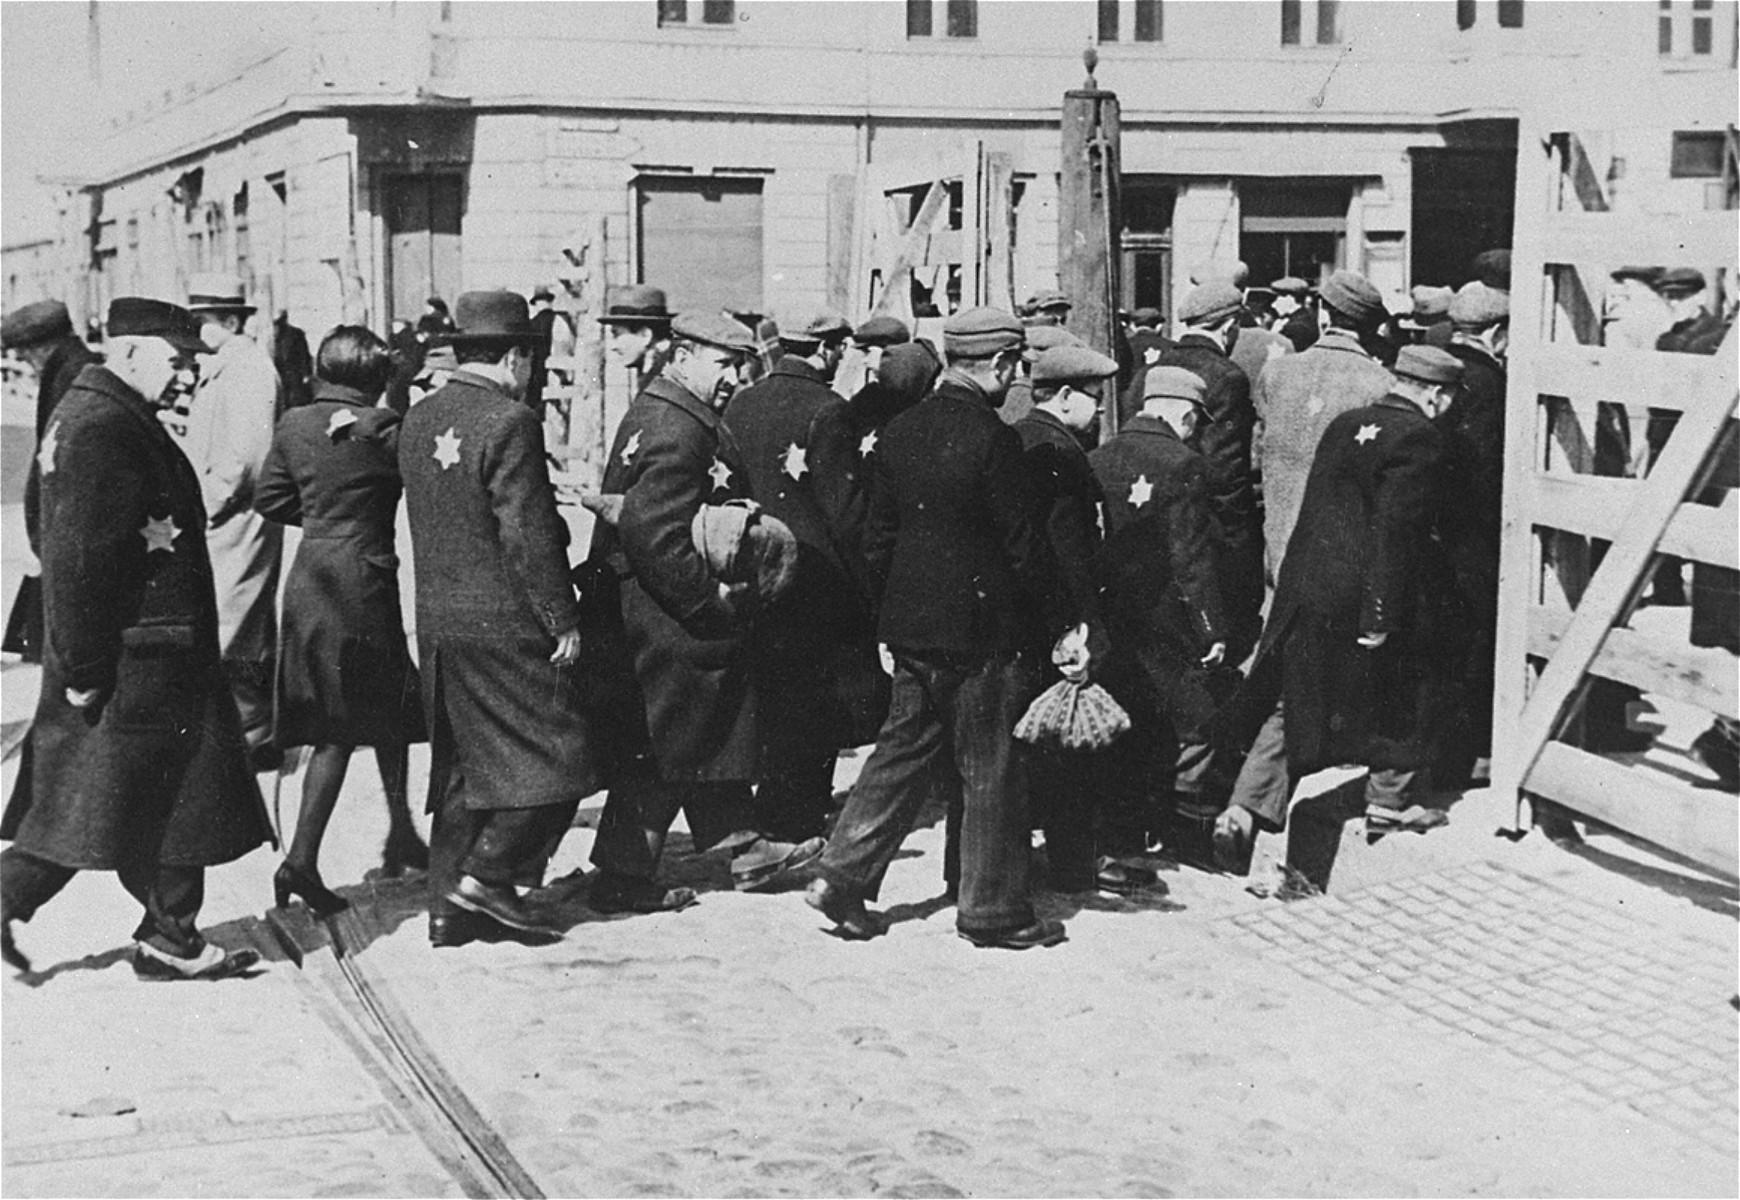 Jewish men and women entering the Lodz ghetto.